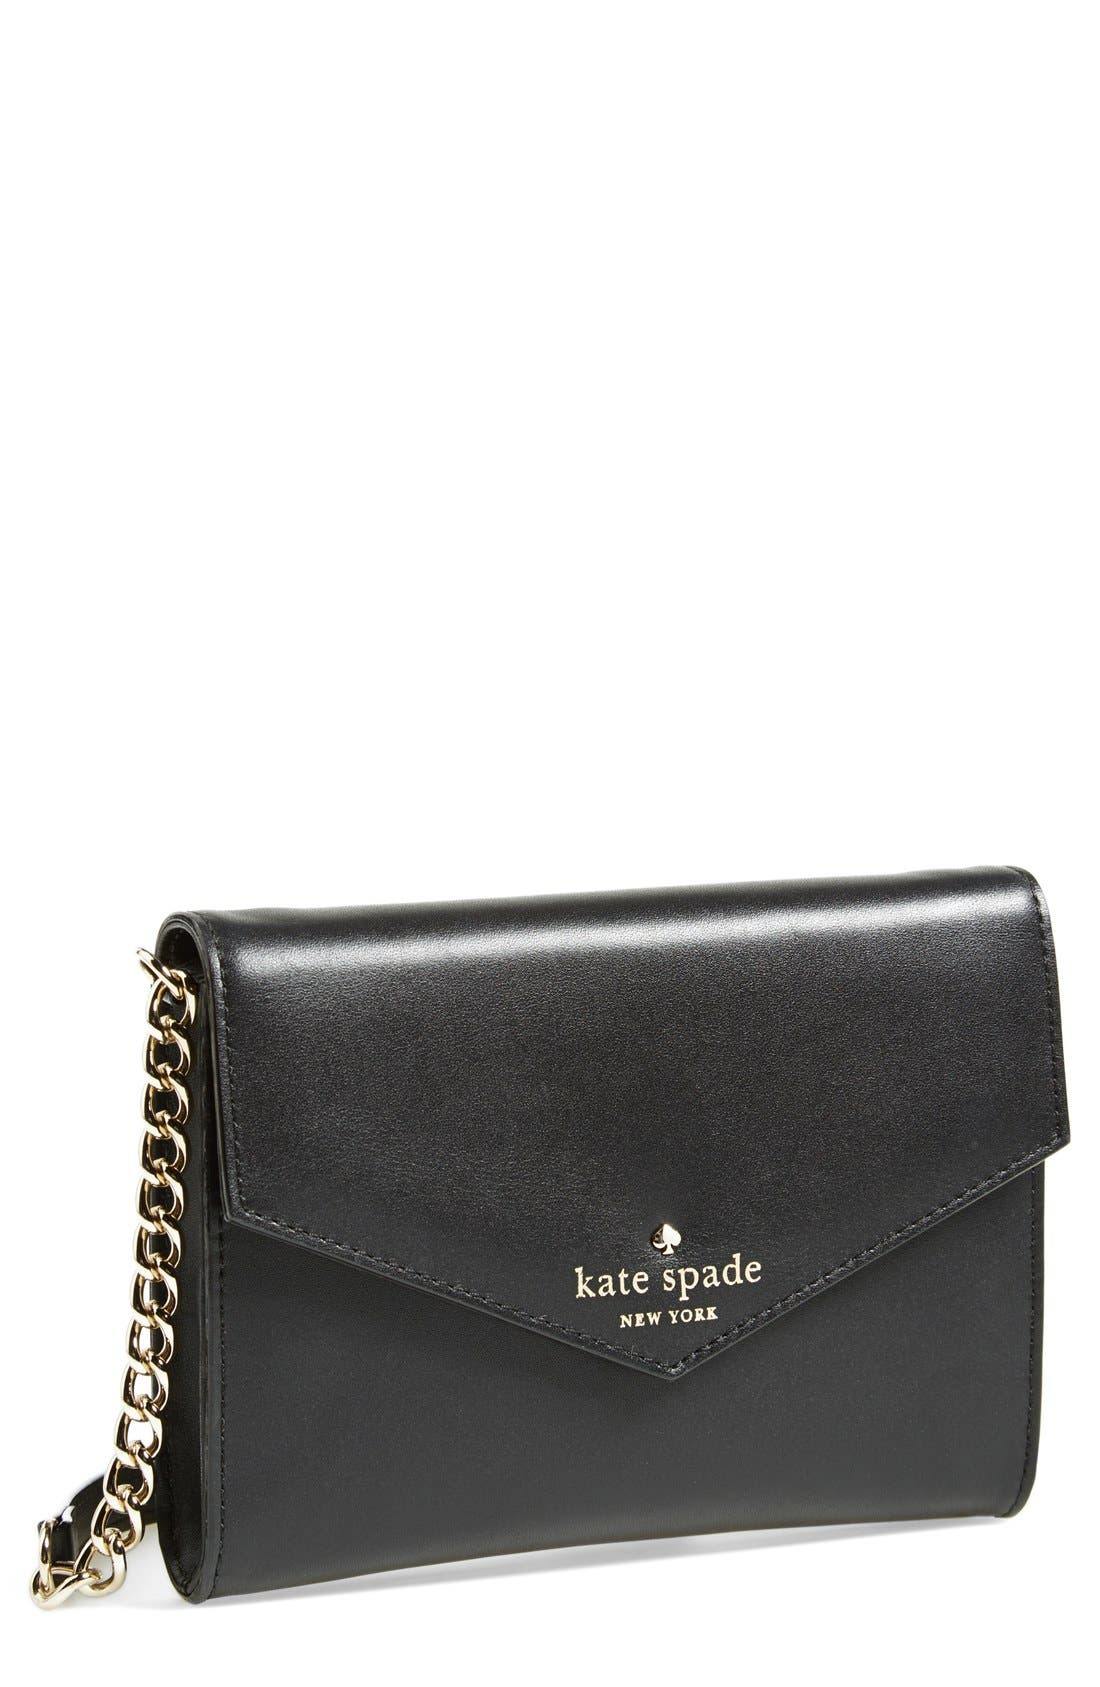 Main Image - kate spade new york 'branton square - monday' crossbody bag (Nordstrom Exclusive)